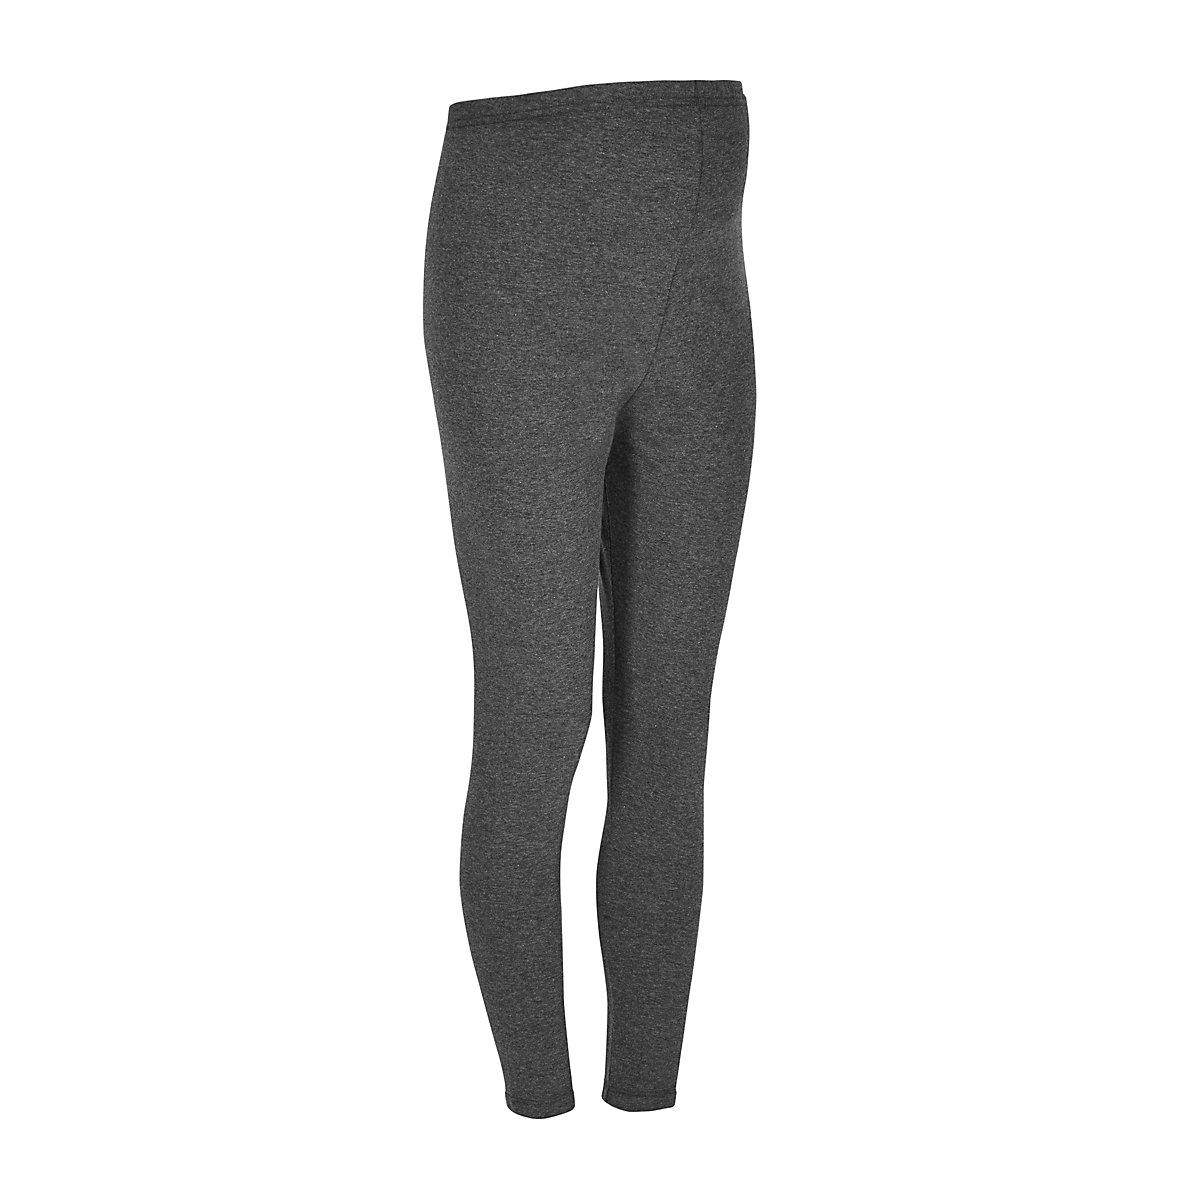 grey jersey maternity leggings